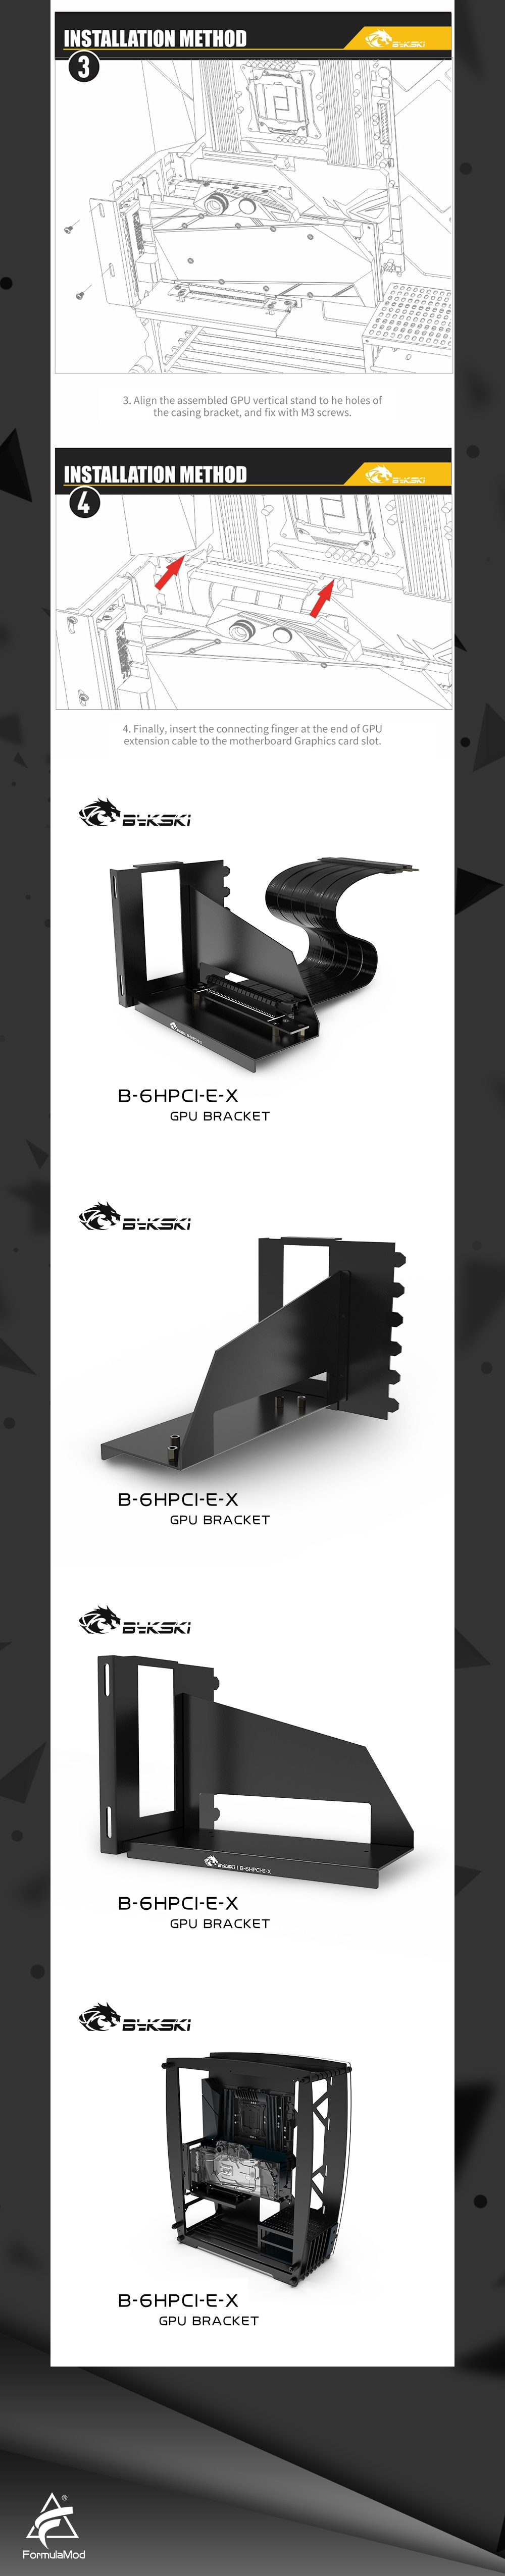 Bykski GPU Stand, Graphics Card Vertical Holder With PCI Express Extension Cable , Fixed GPU PCI-E Built-in Vertical Bracket, B-6HPCI-E-X